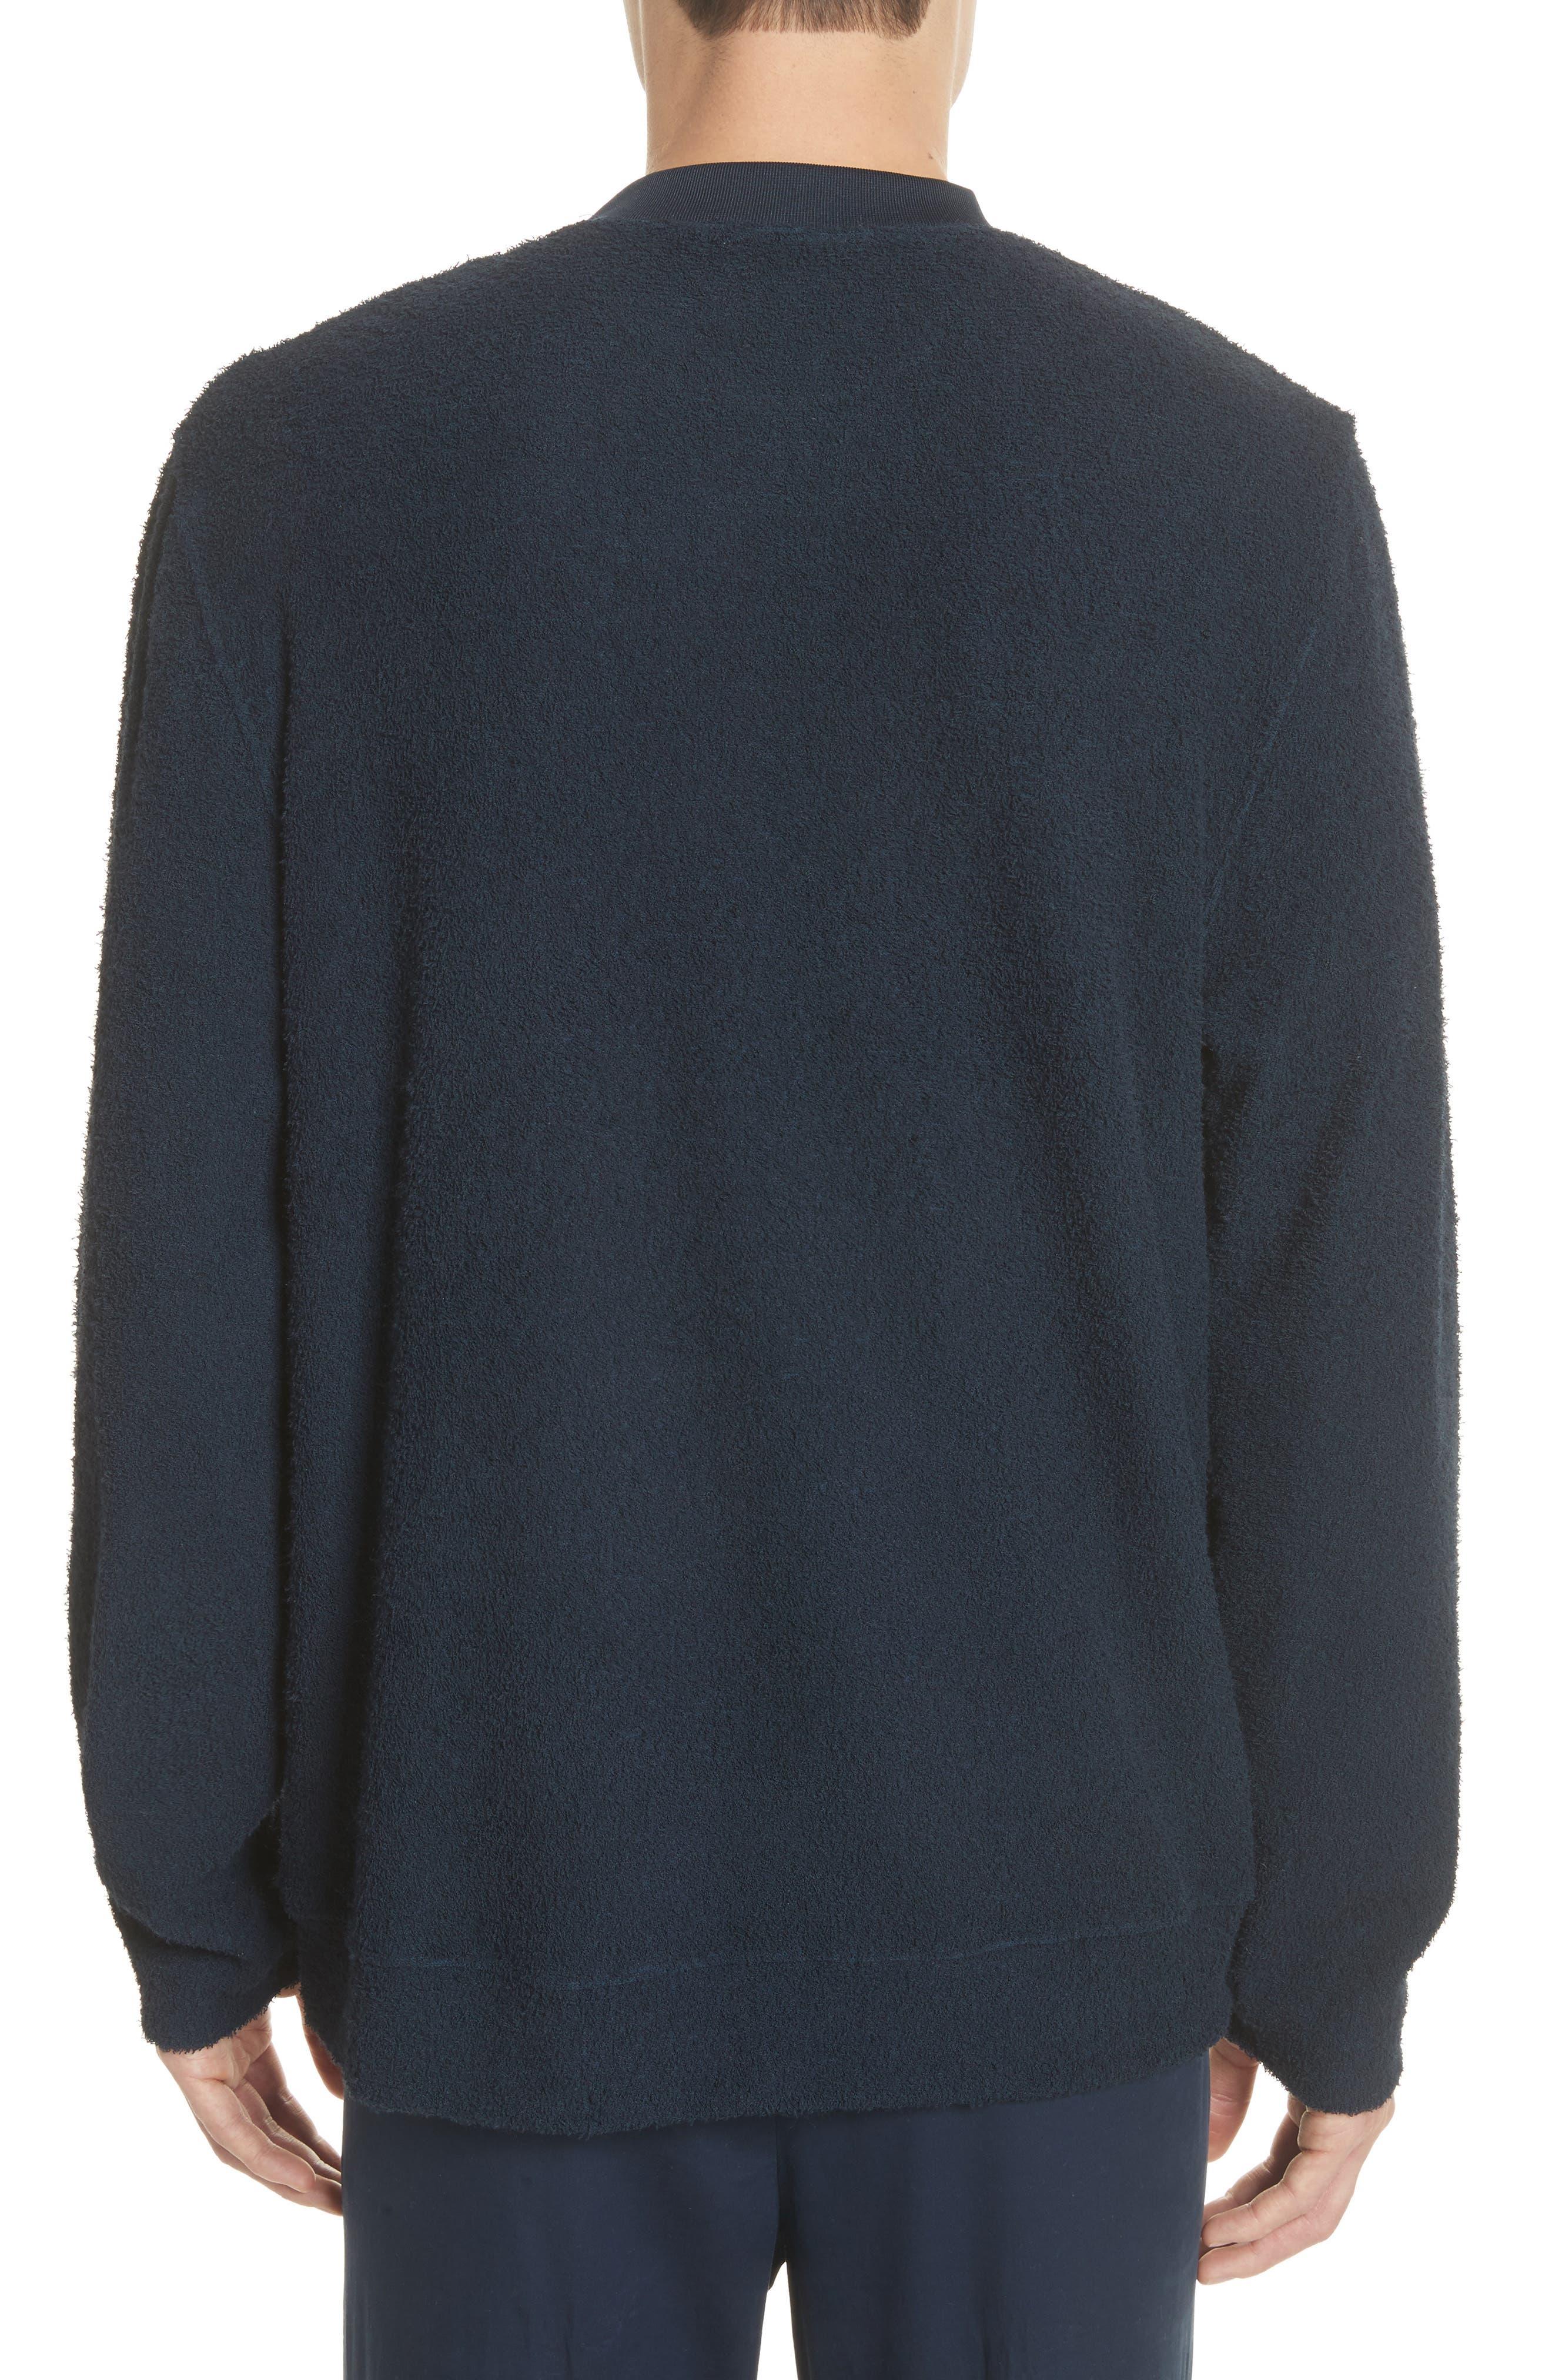 Rask Crewneck Sweatshirt,                             Alternate thumbnail 2, color,                             Dark Navy